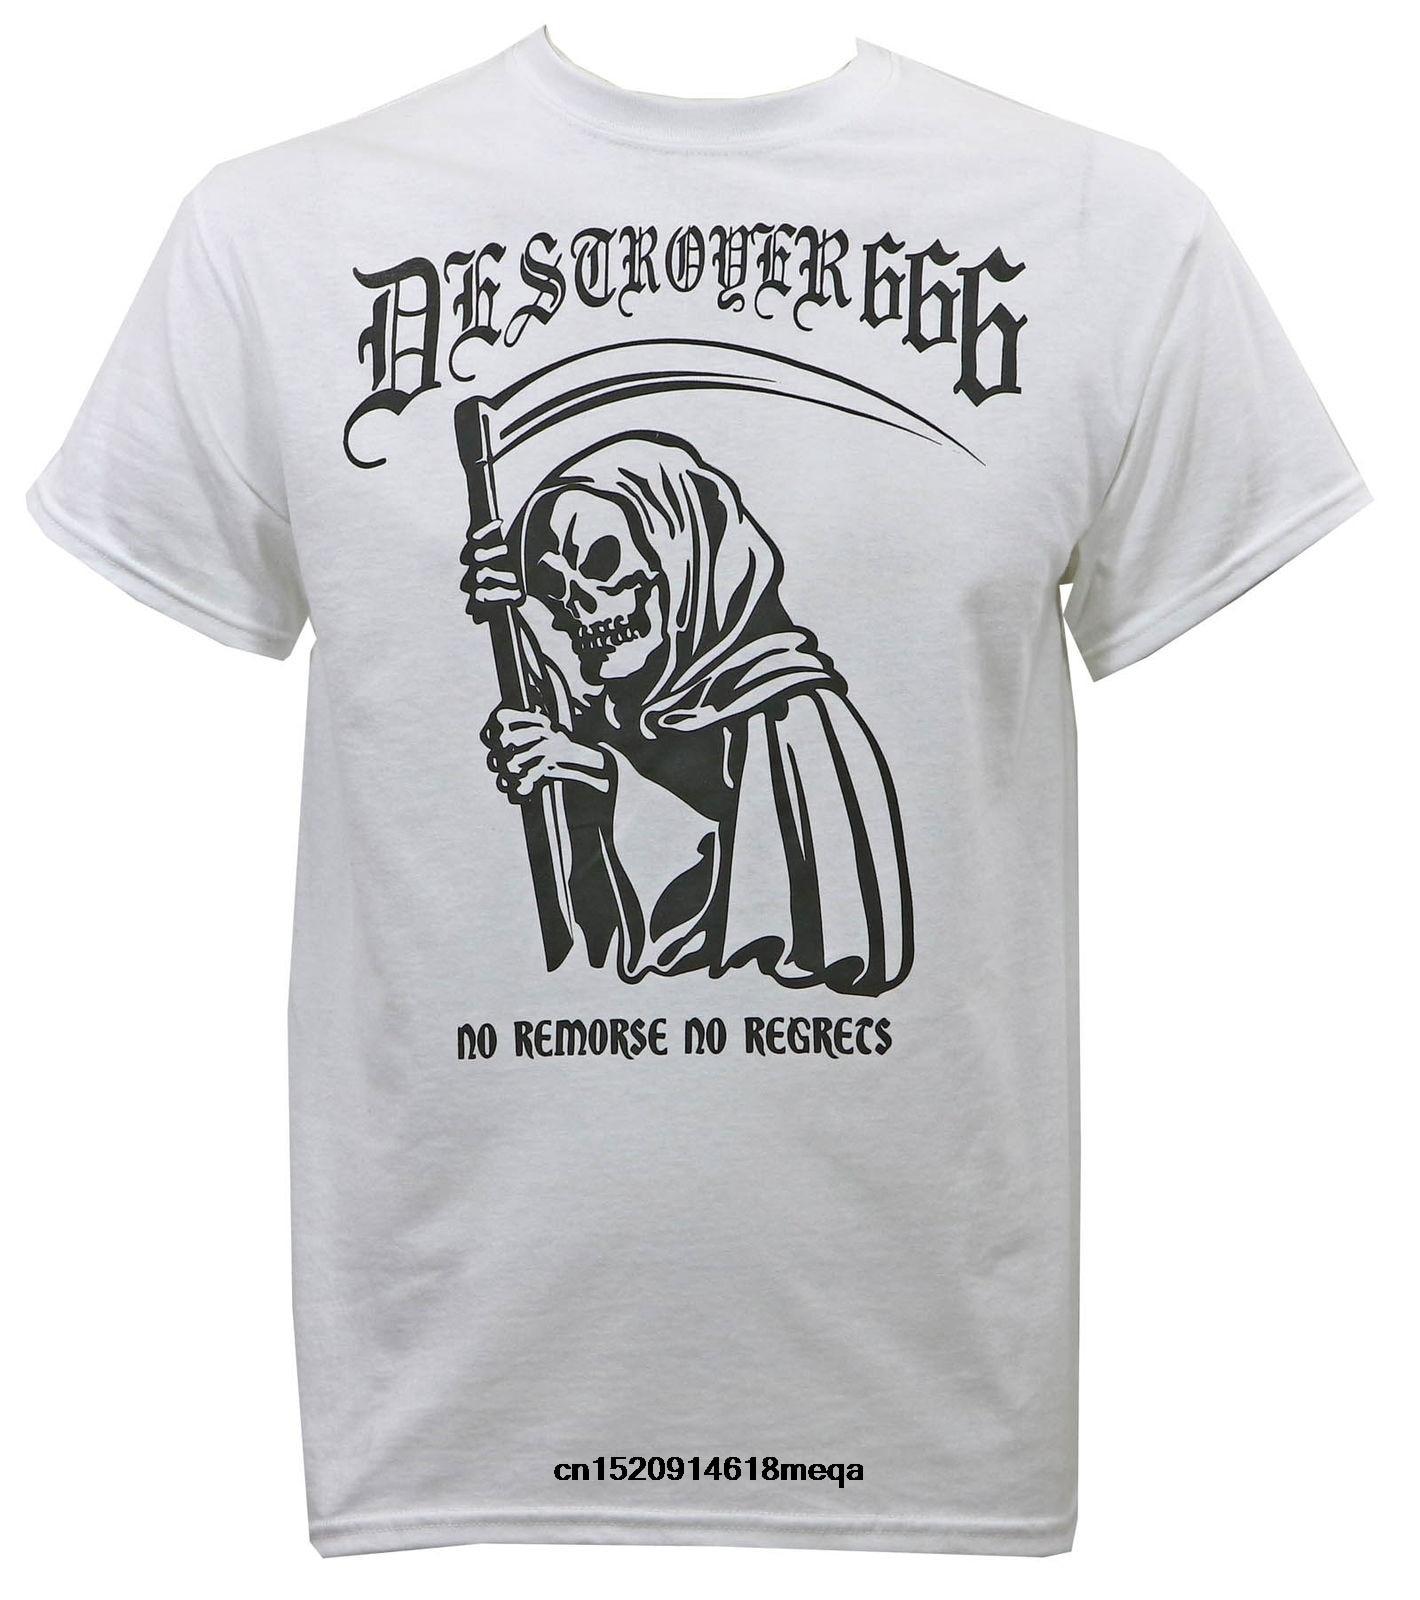 Camisetas divertidas destructor 666 Band No regreds camiseta blanca S-3XL